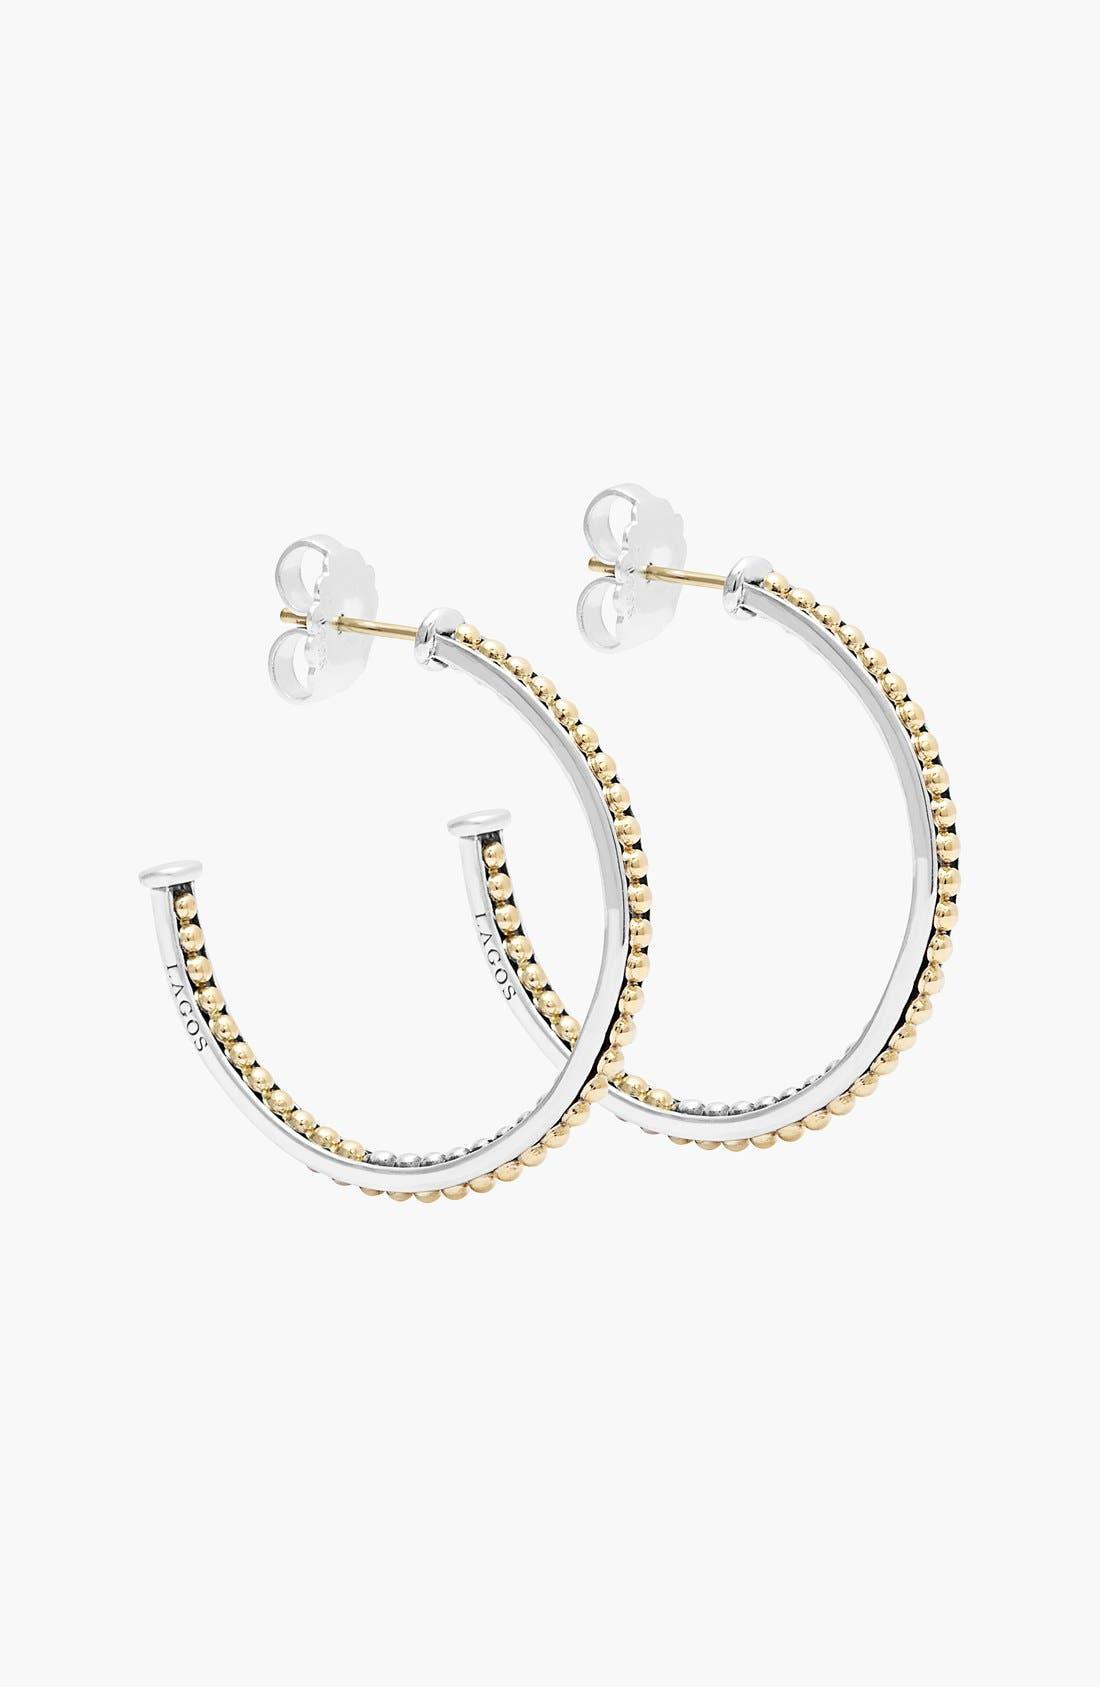 'Enso' Caviar Hoop Earrings,                             Alternate thumbnail 4, color,                             SILVER/ GOLD